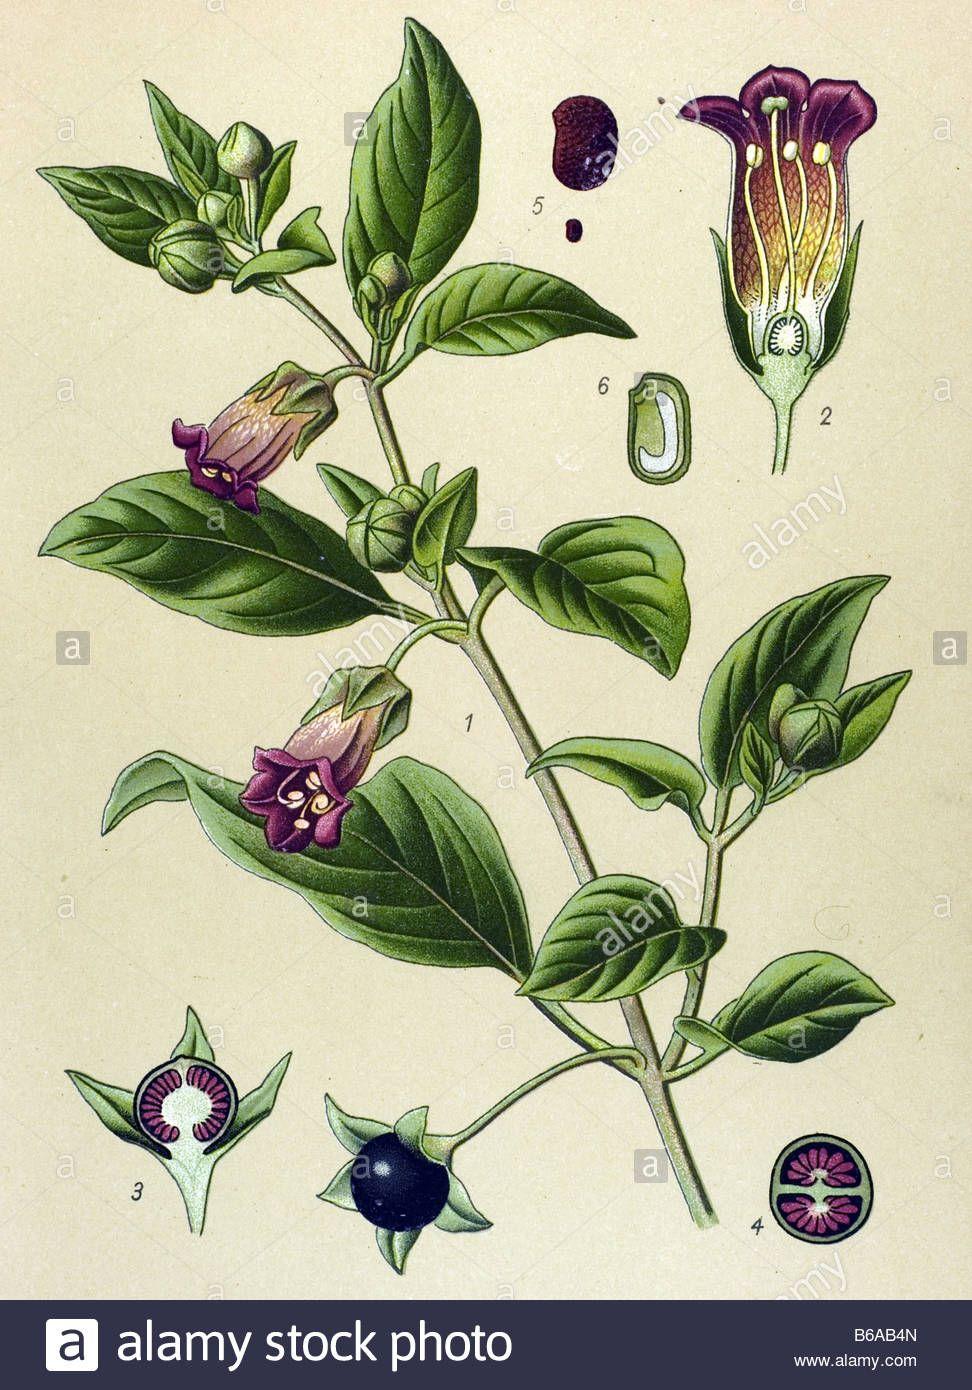 atropa belladonna illustration